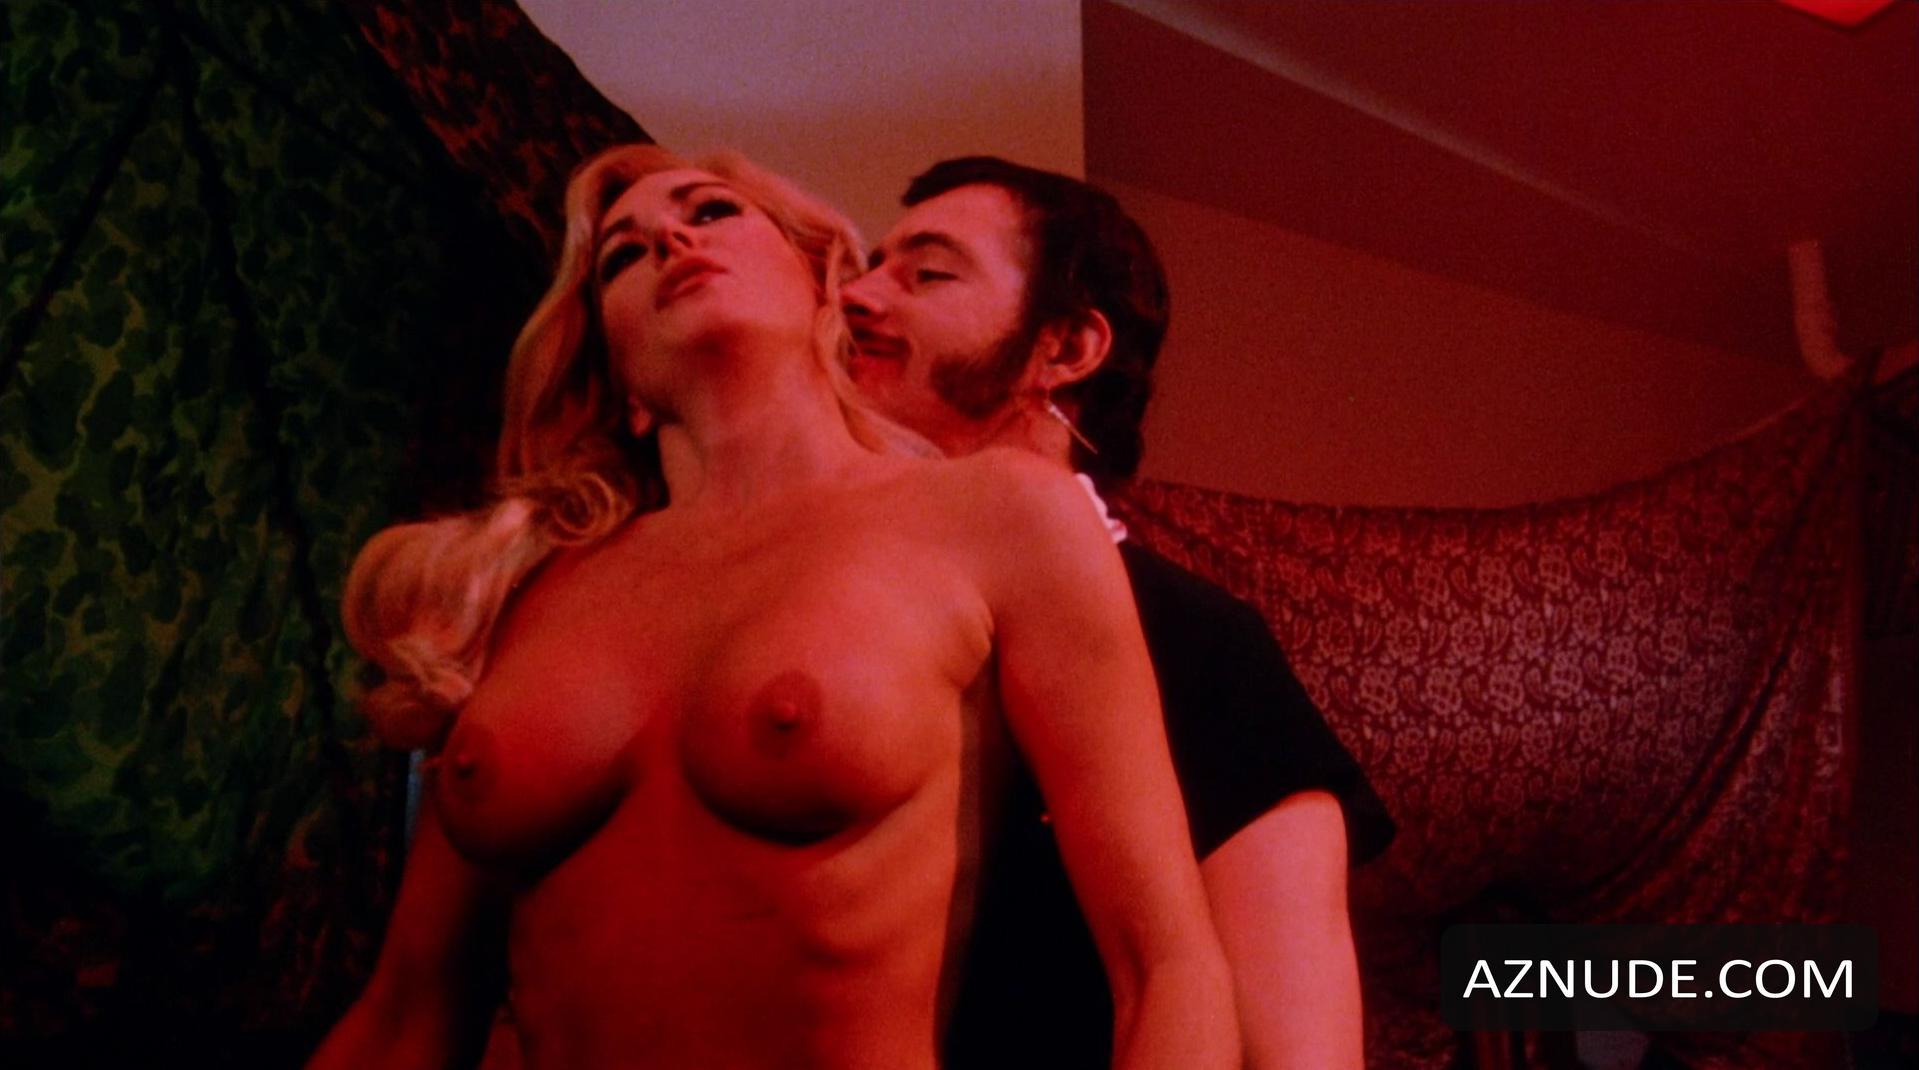 Sex from i peccati di una casalinga 1999 angelica bella - 3 part 5